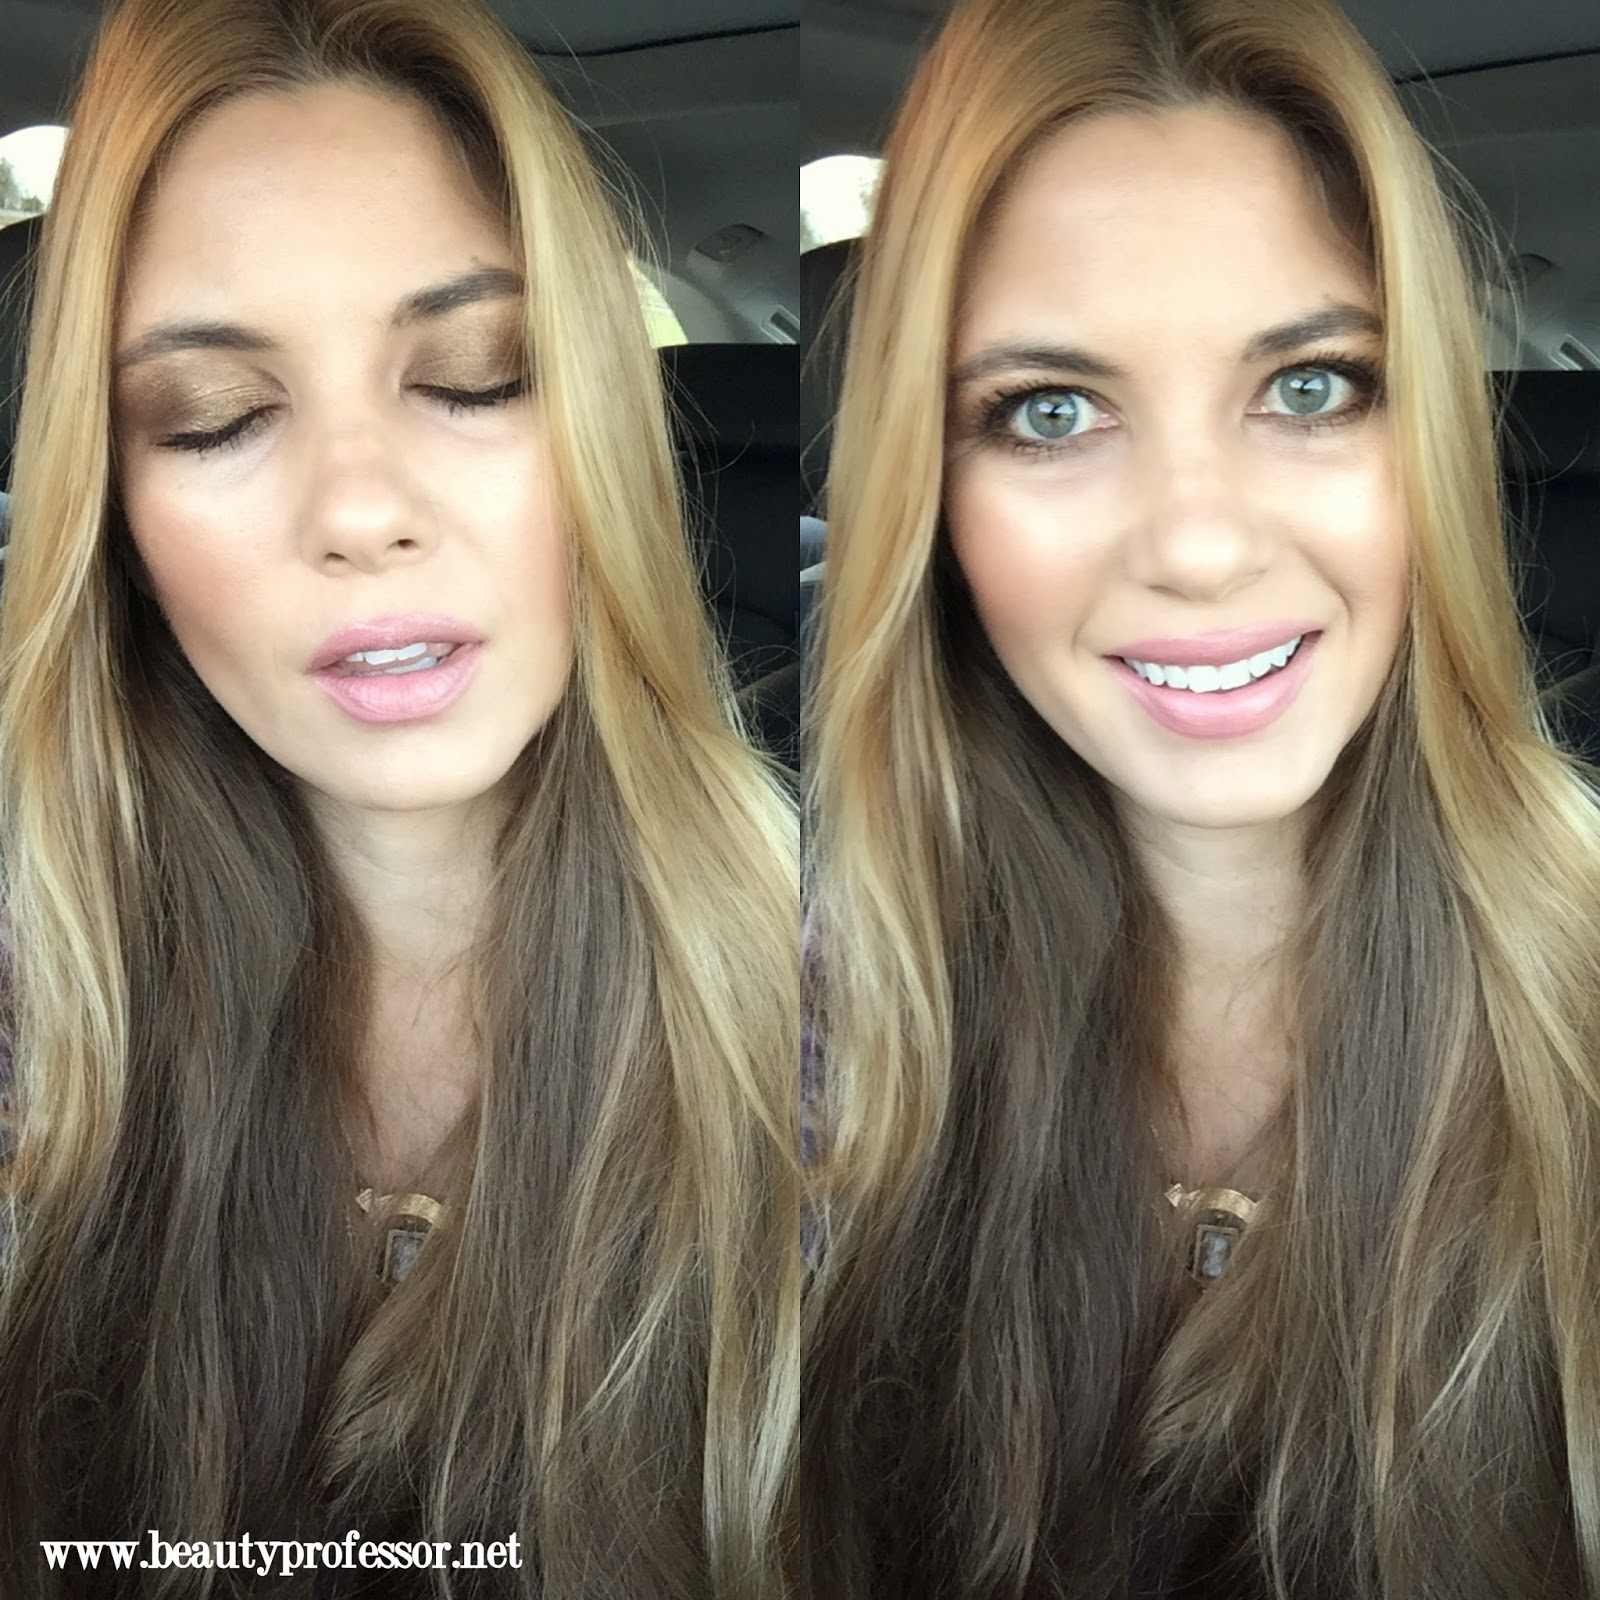 more makeup charlotte tom fenty haul beauty pat high luxury end ford watch tilbury mcgrath